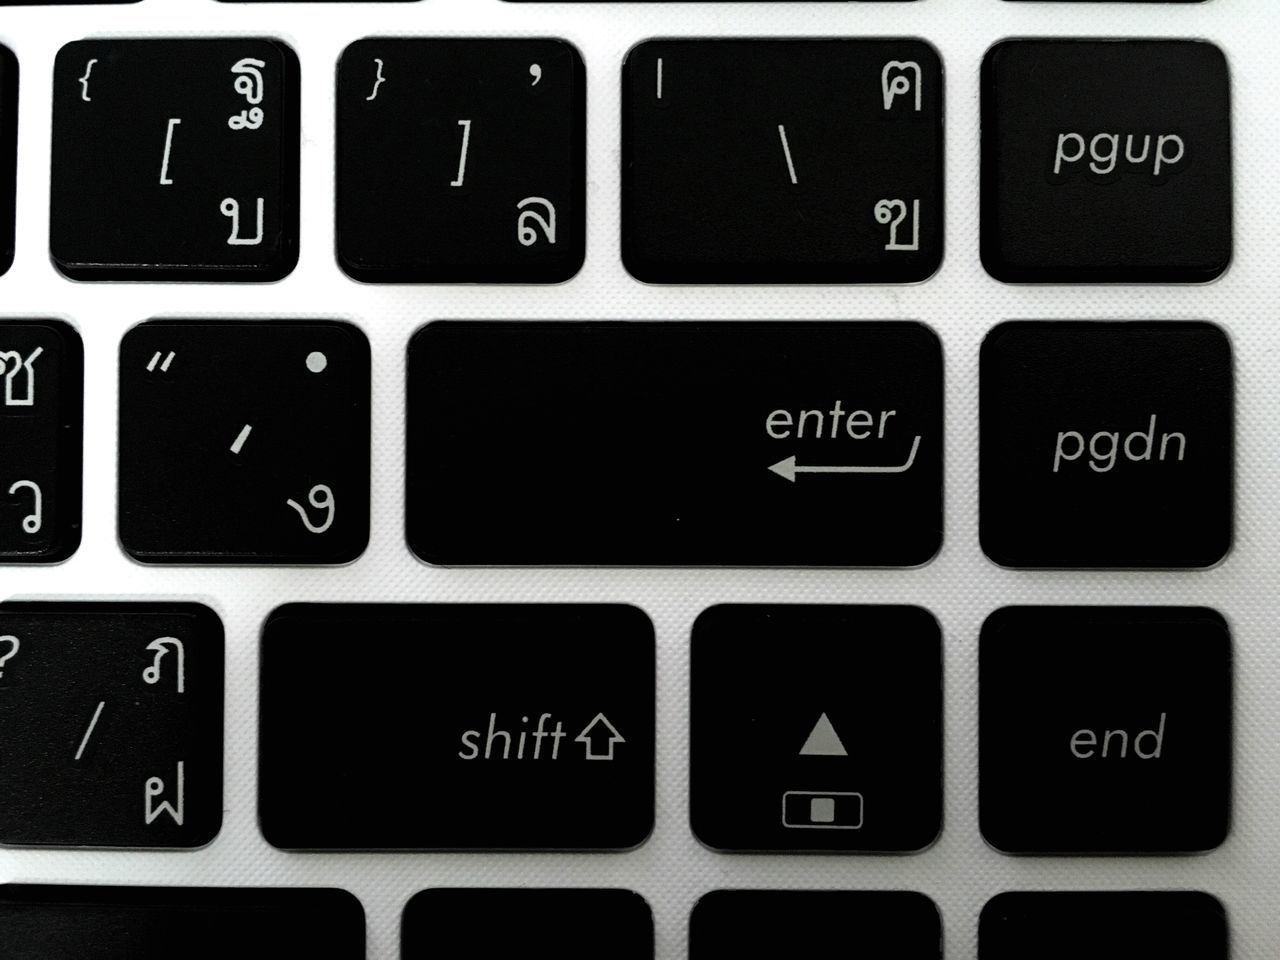 Full Frame Shot Of Keyboard